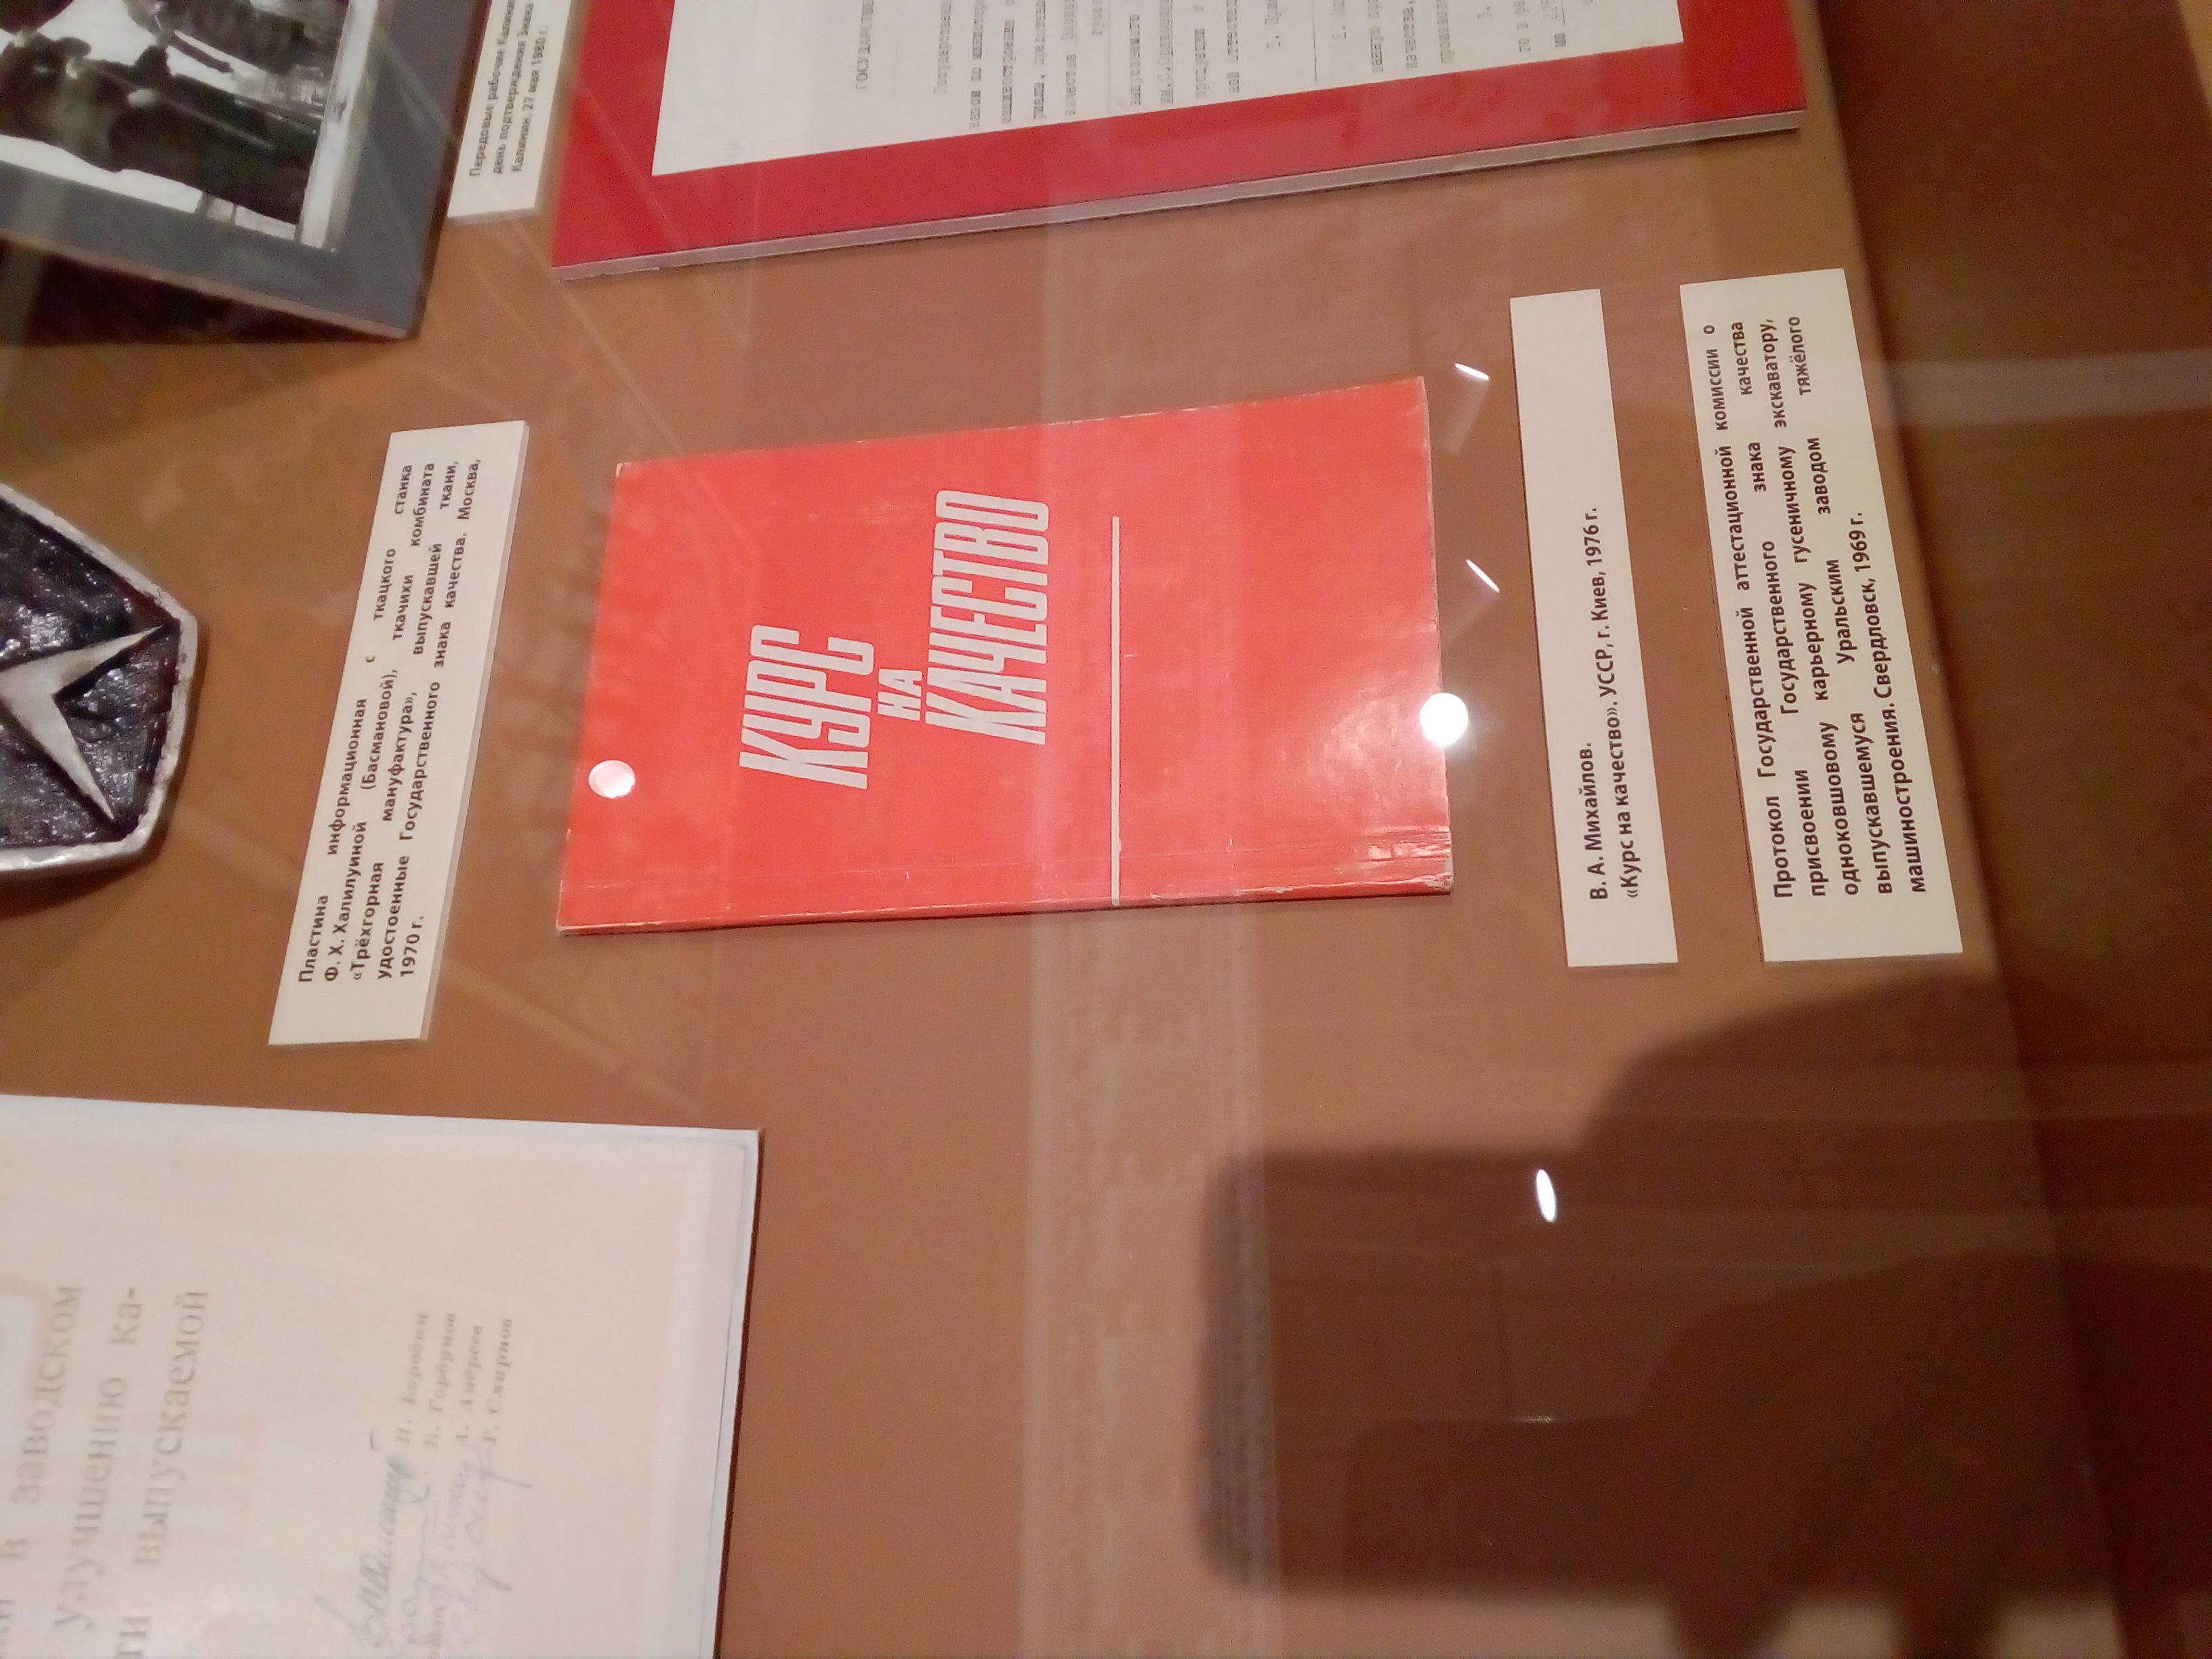 Книга Курс на качество, Киев, УССР, 1976